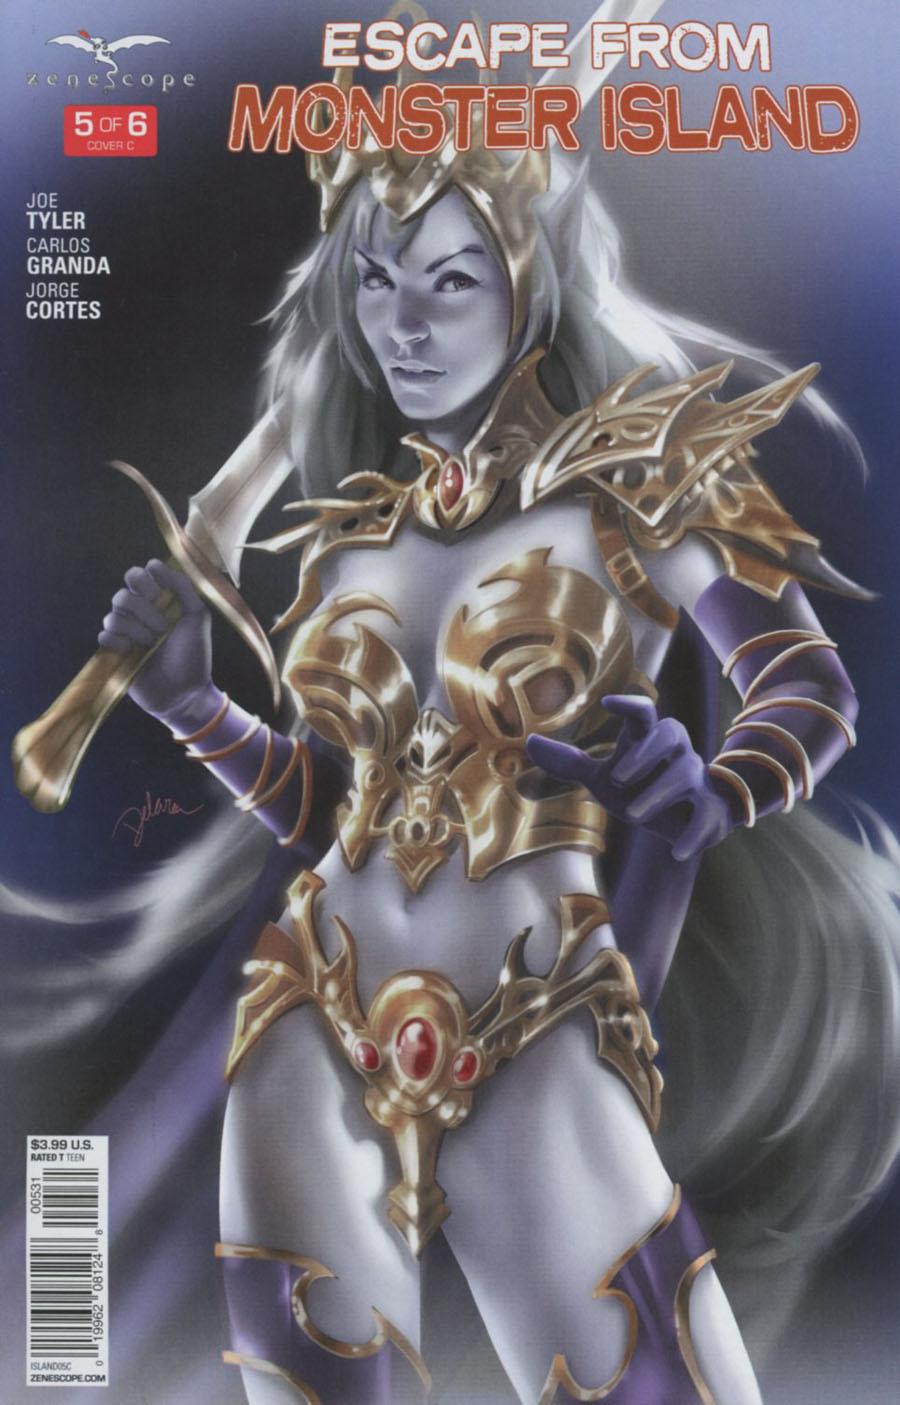 Grimm Fairy Tales Presents Escape From Monster Island #5 Cover C Cris Delara